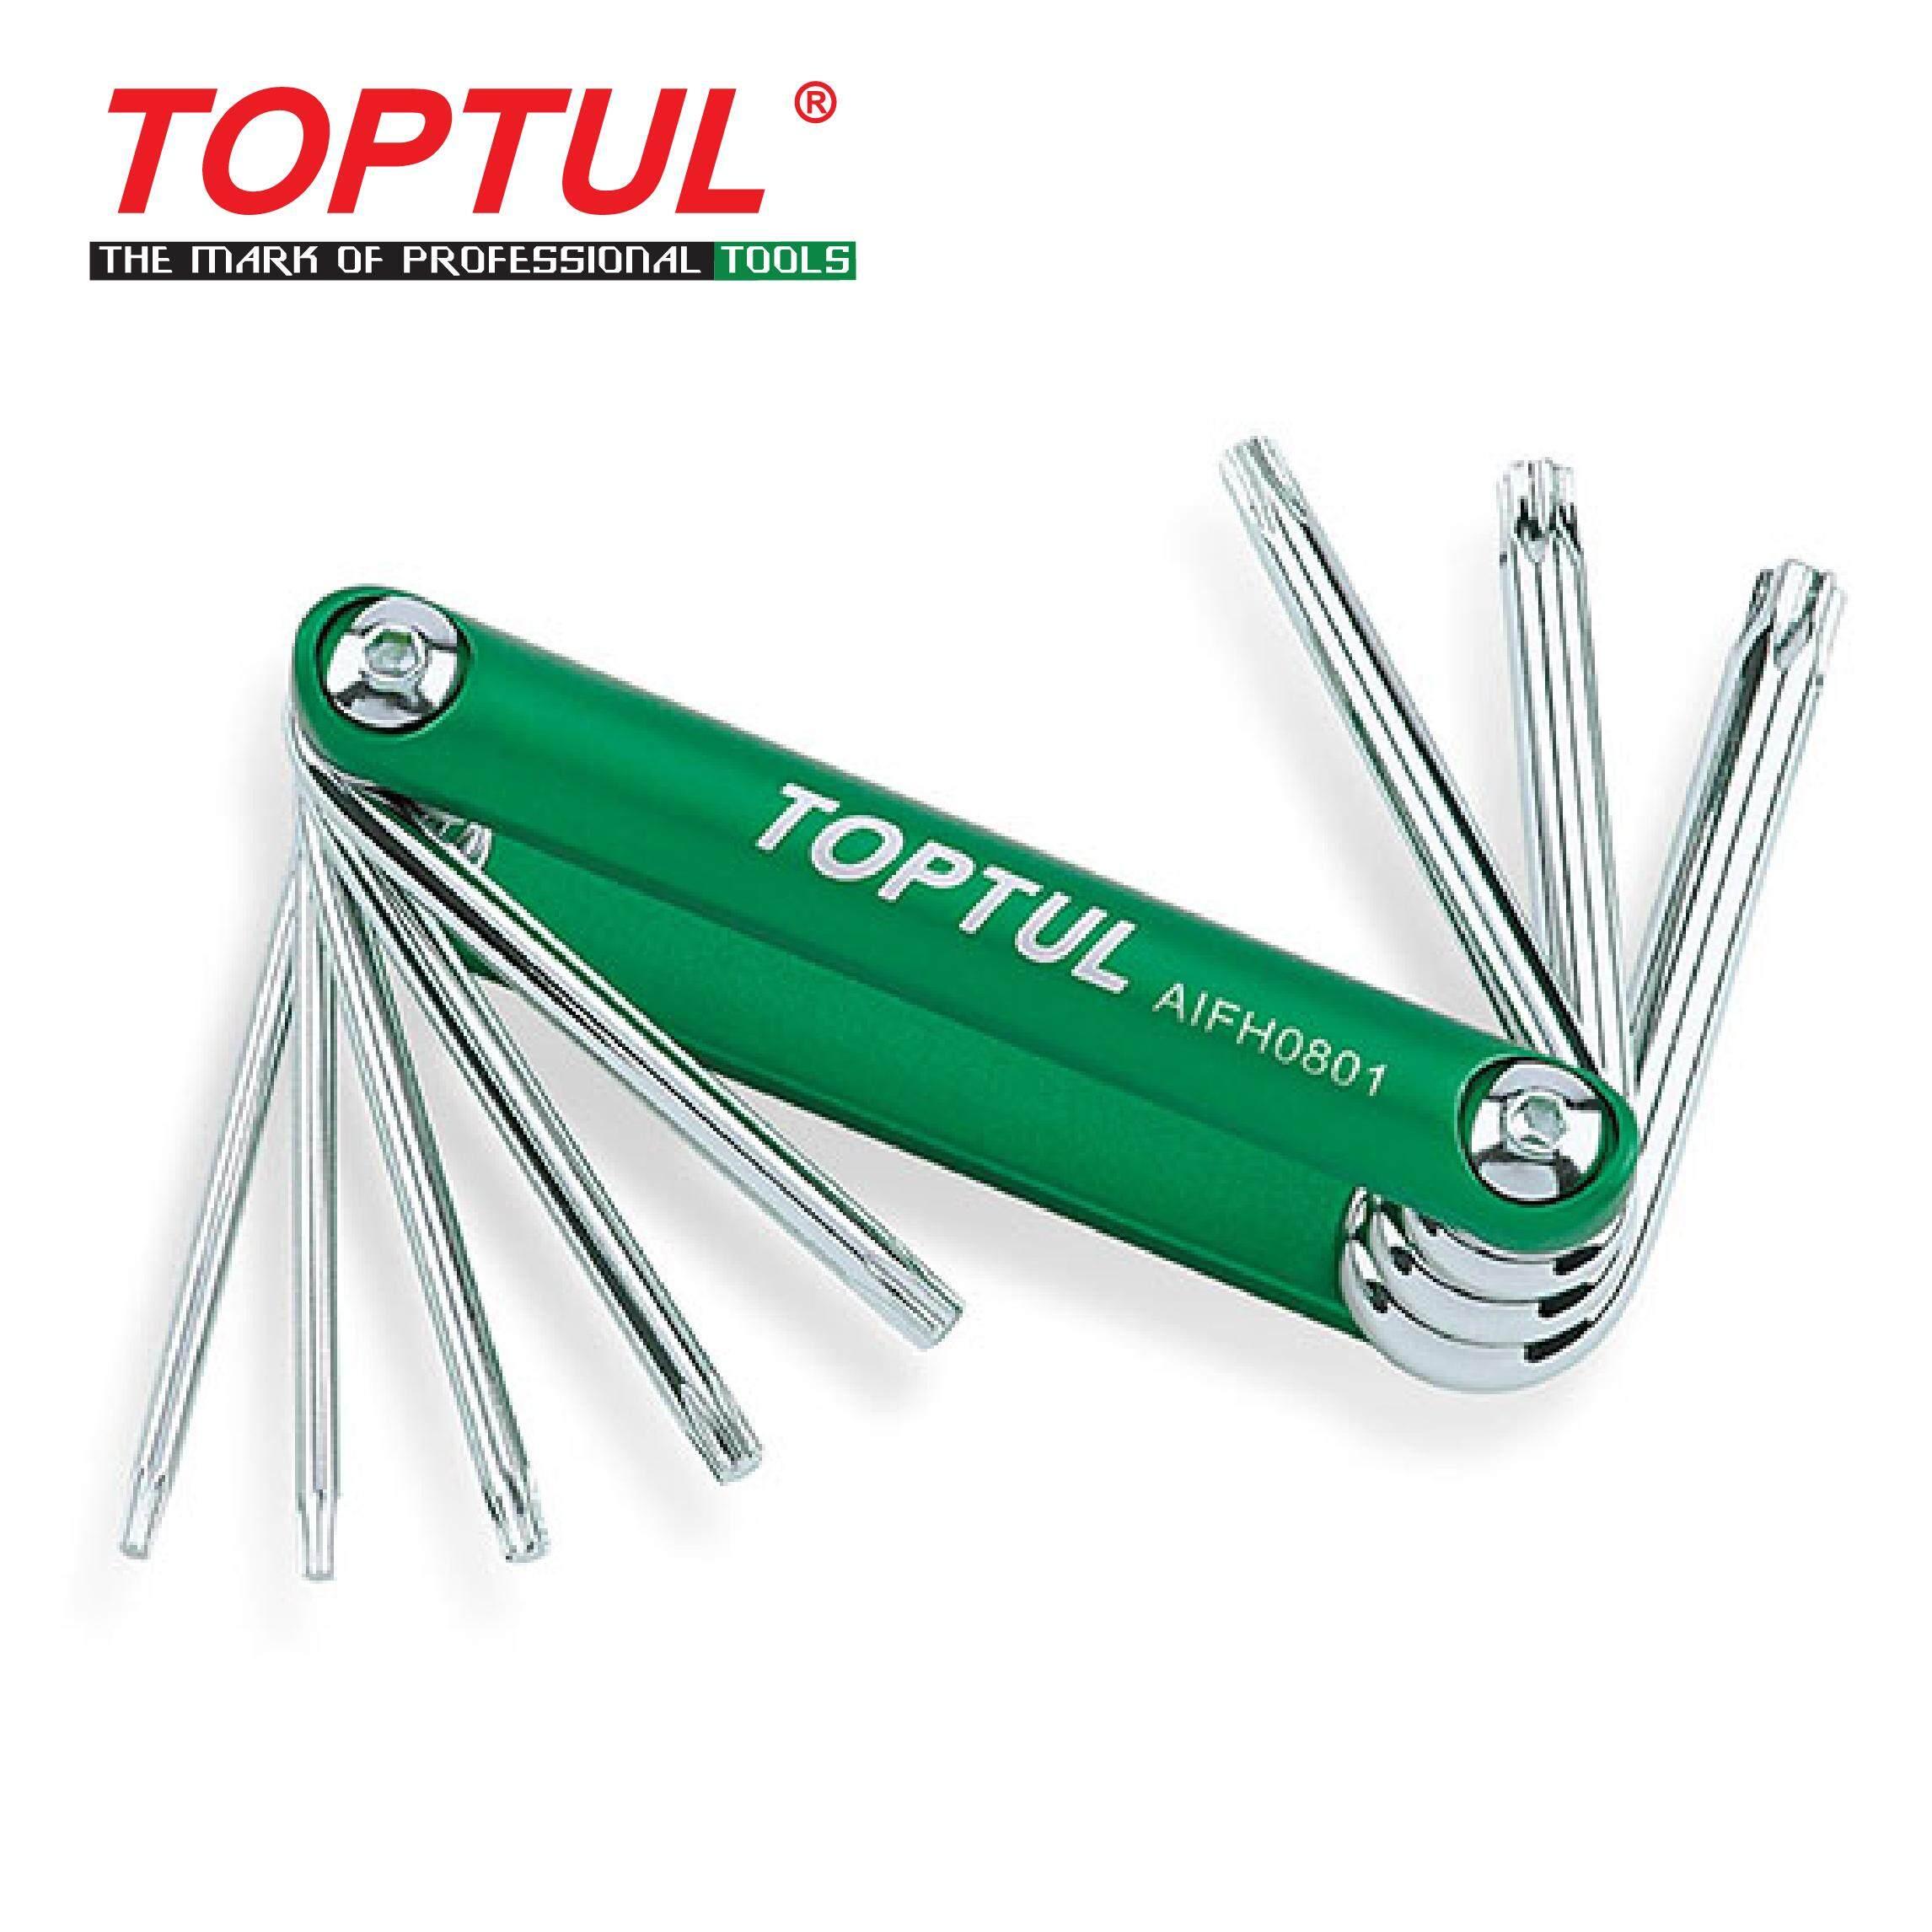 TOPTUL 8-in-1 Folding Star Key Set (AIFH0801)